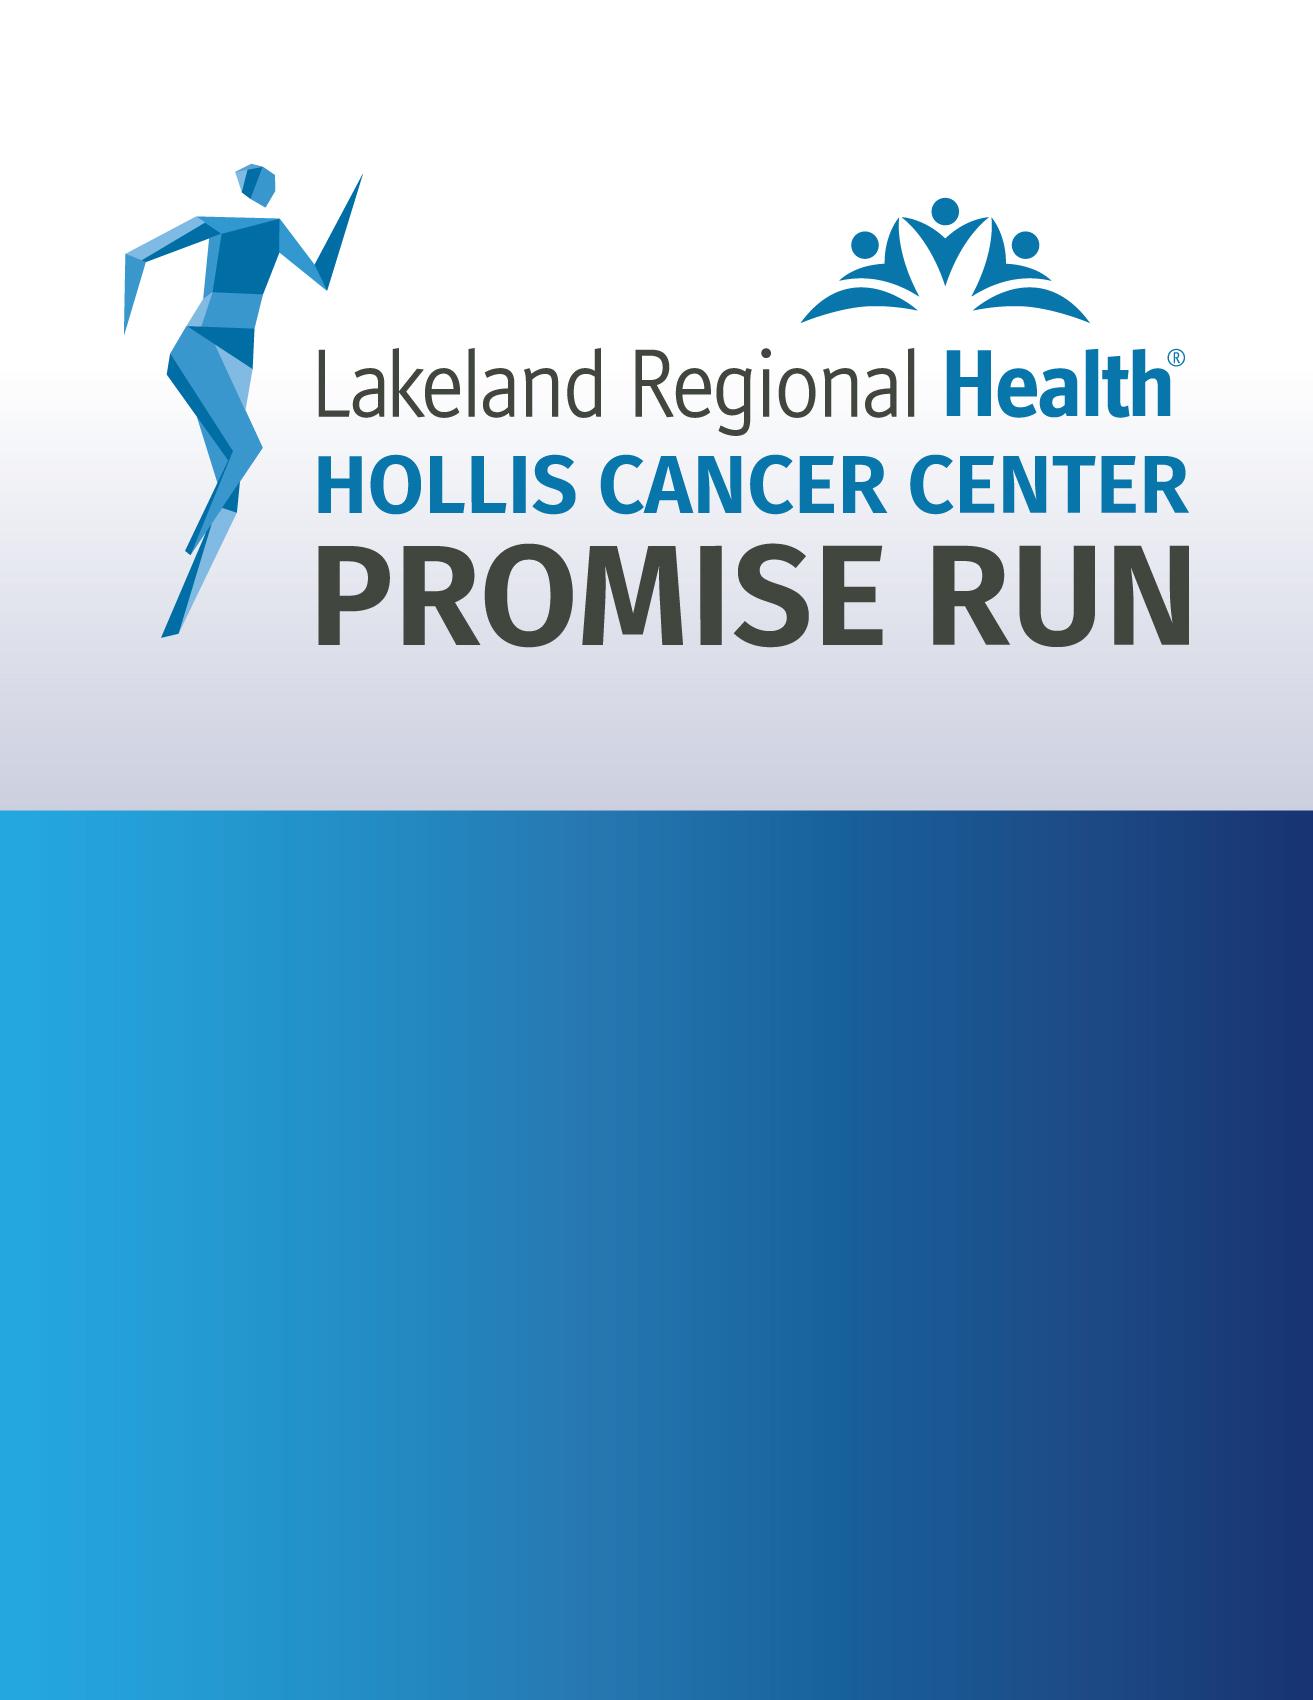 Promise Run 2020 - Lakeland Regional Health